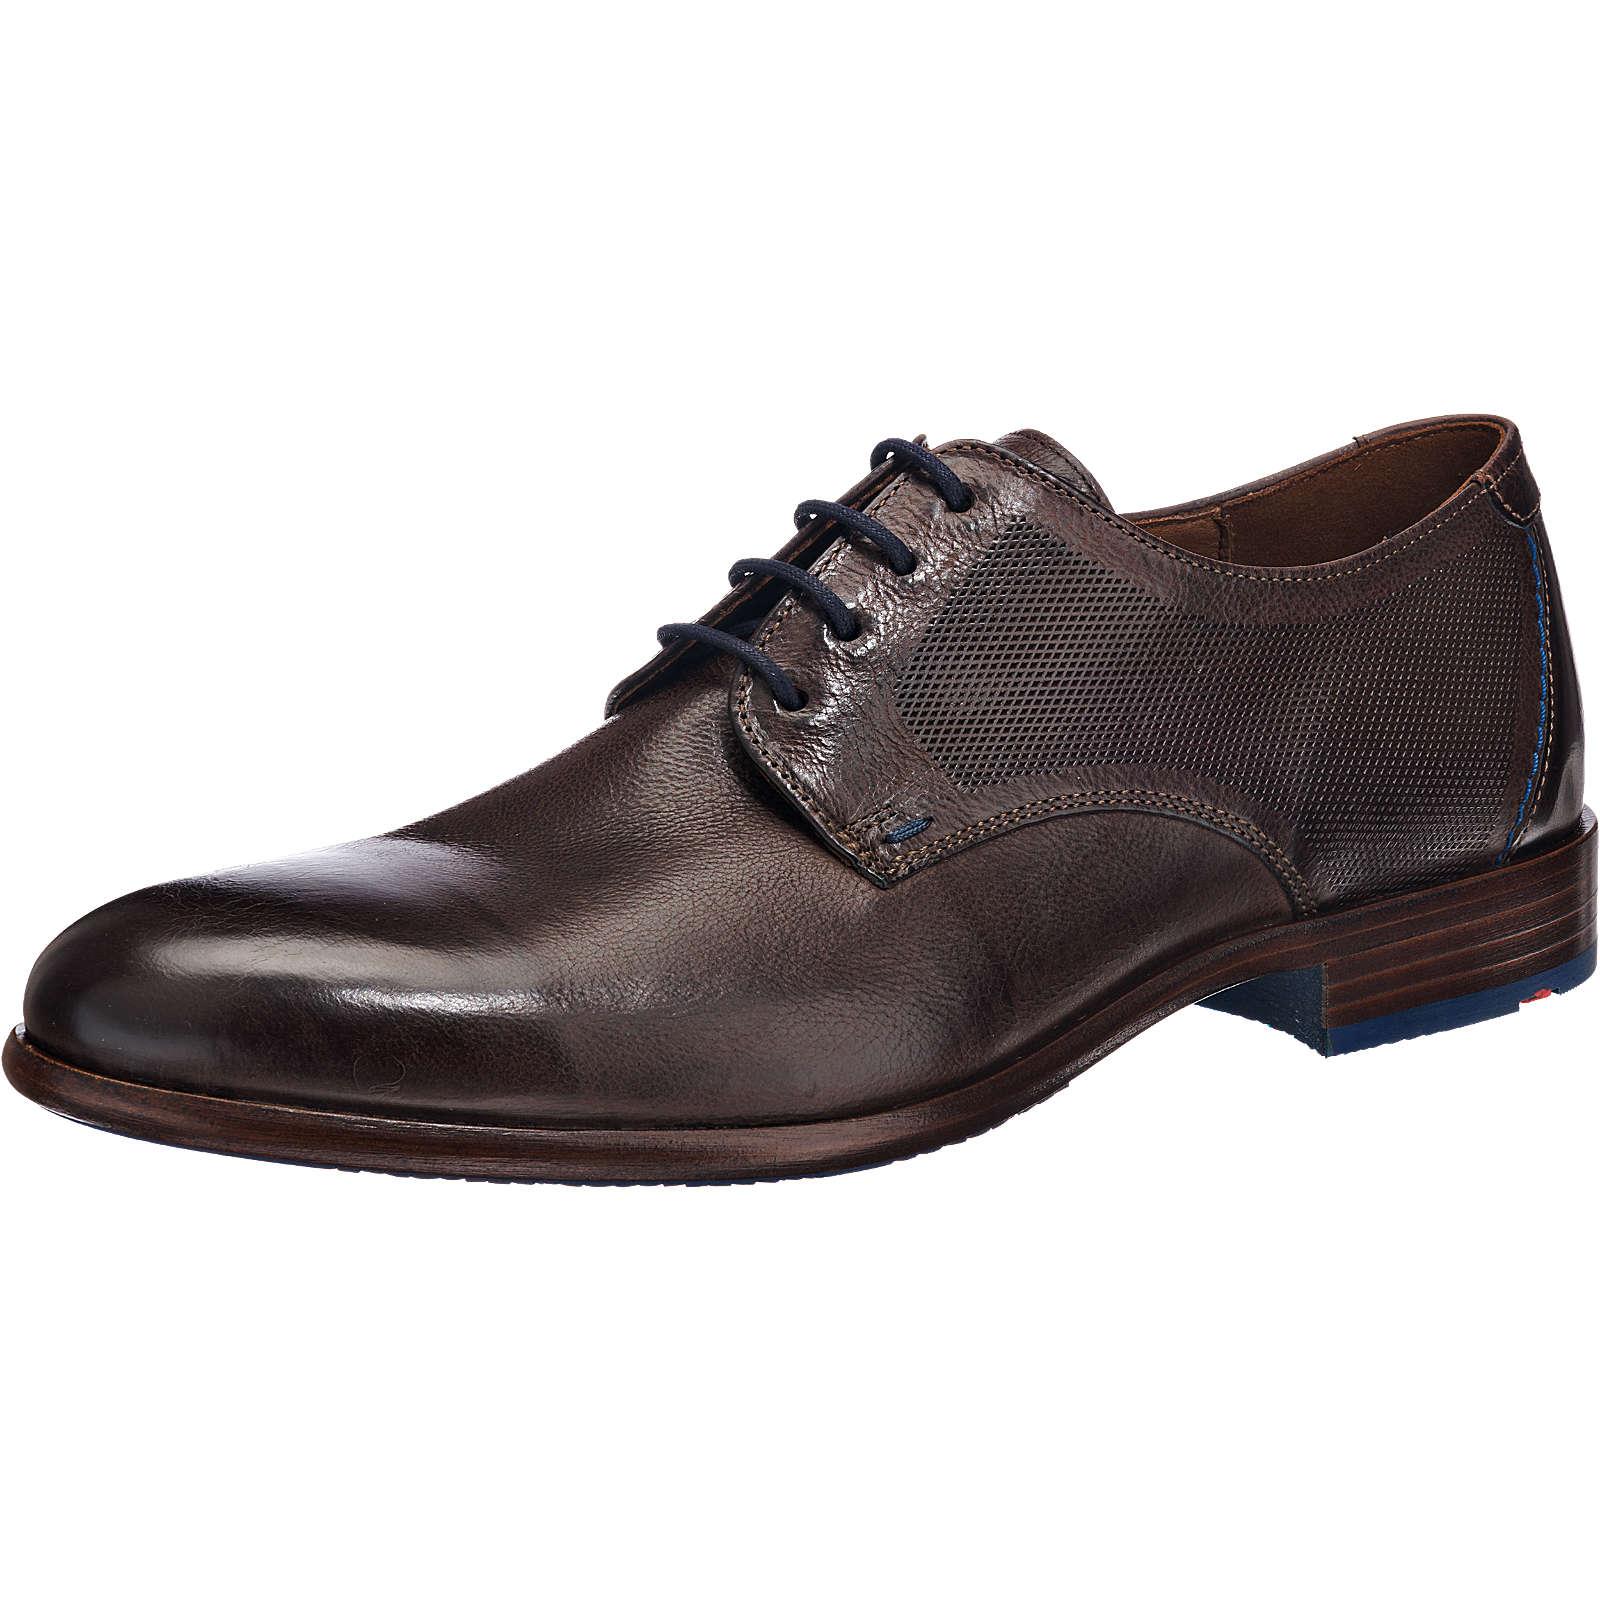 LLOYD Ferdinand Business Schuhe braun Herren Gr. 44,5